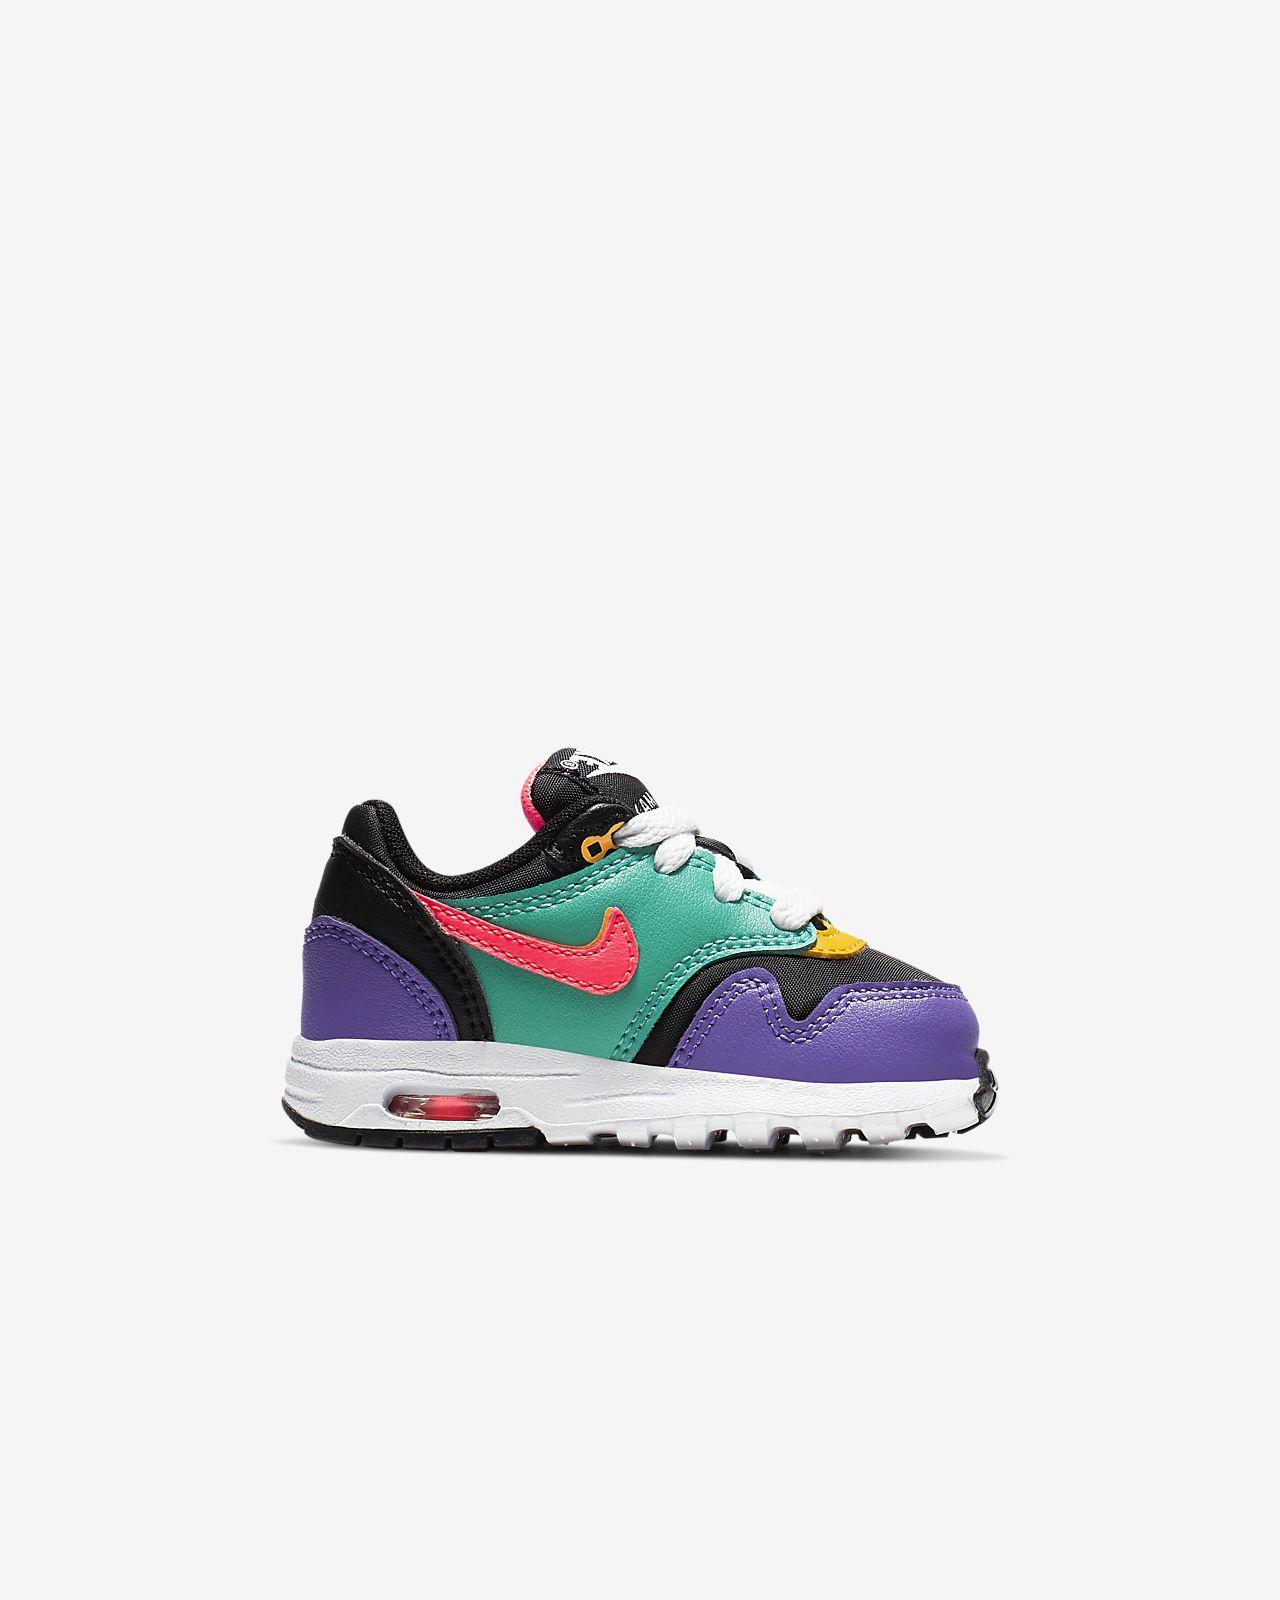 Nike Air Max 1 Game Change InfantToddler Shoe.